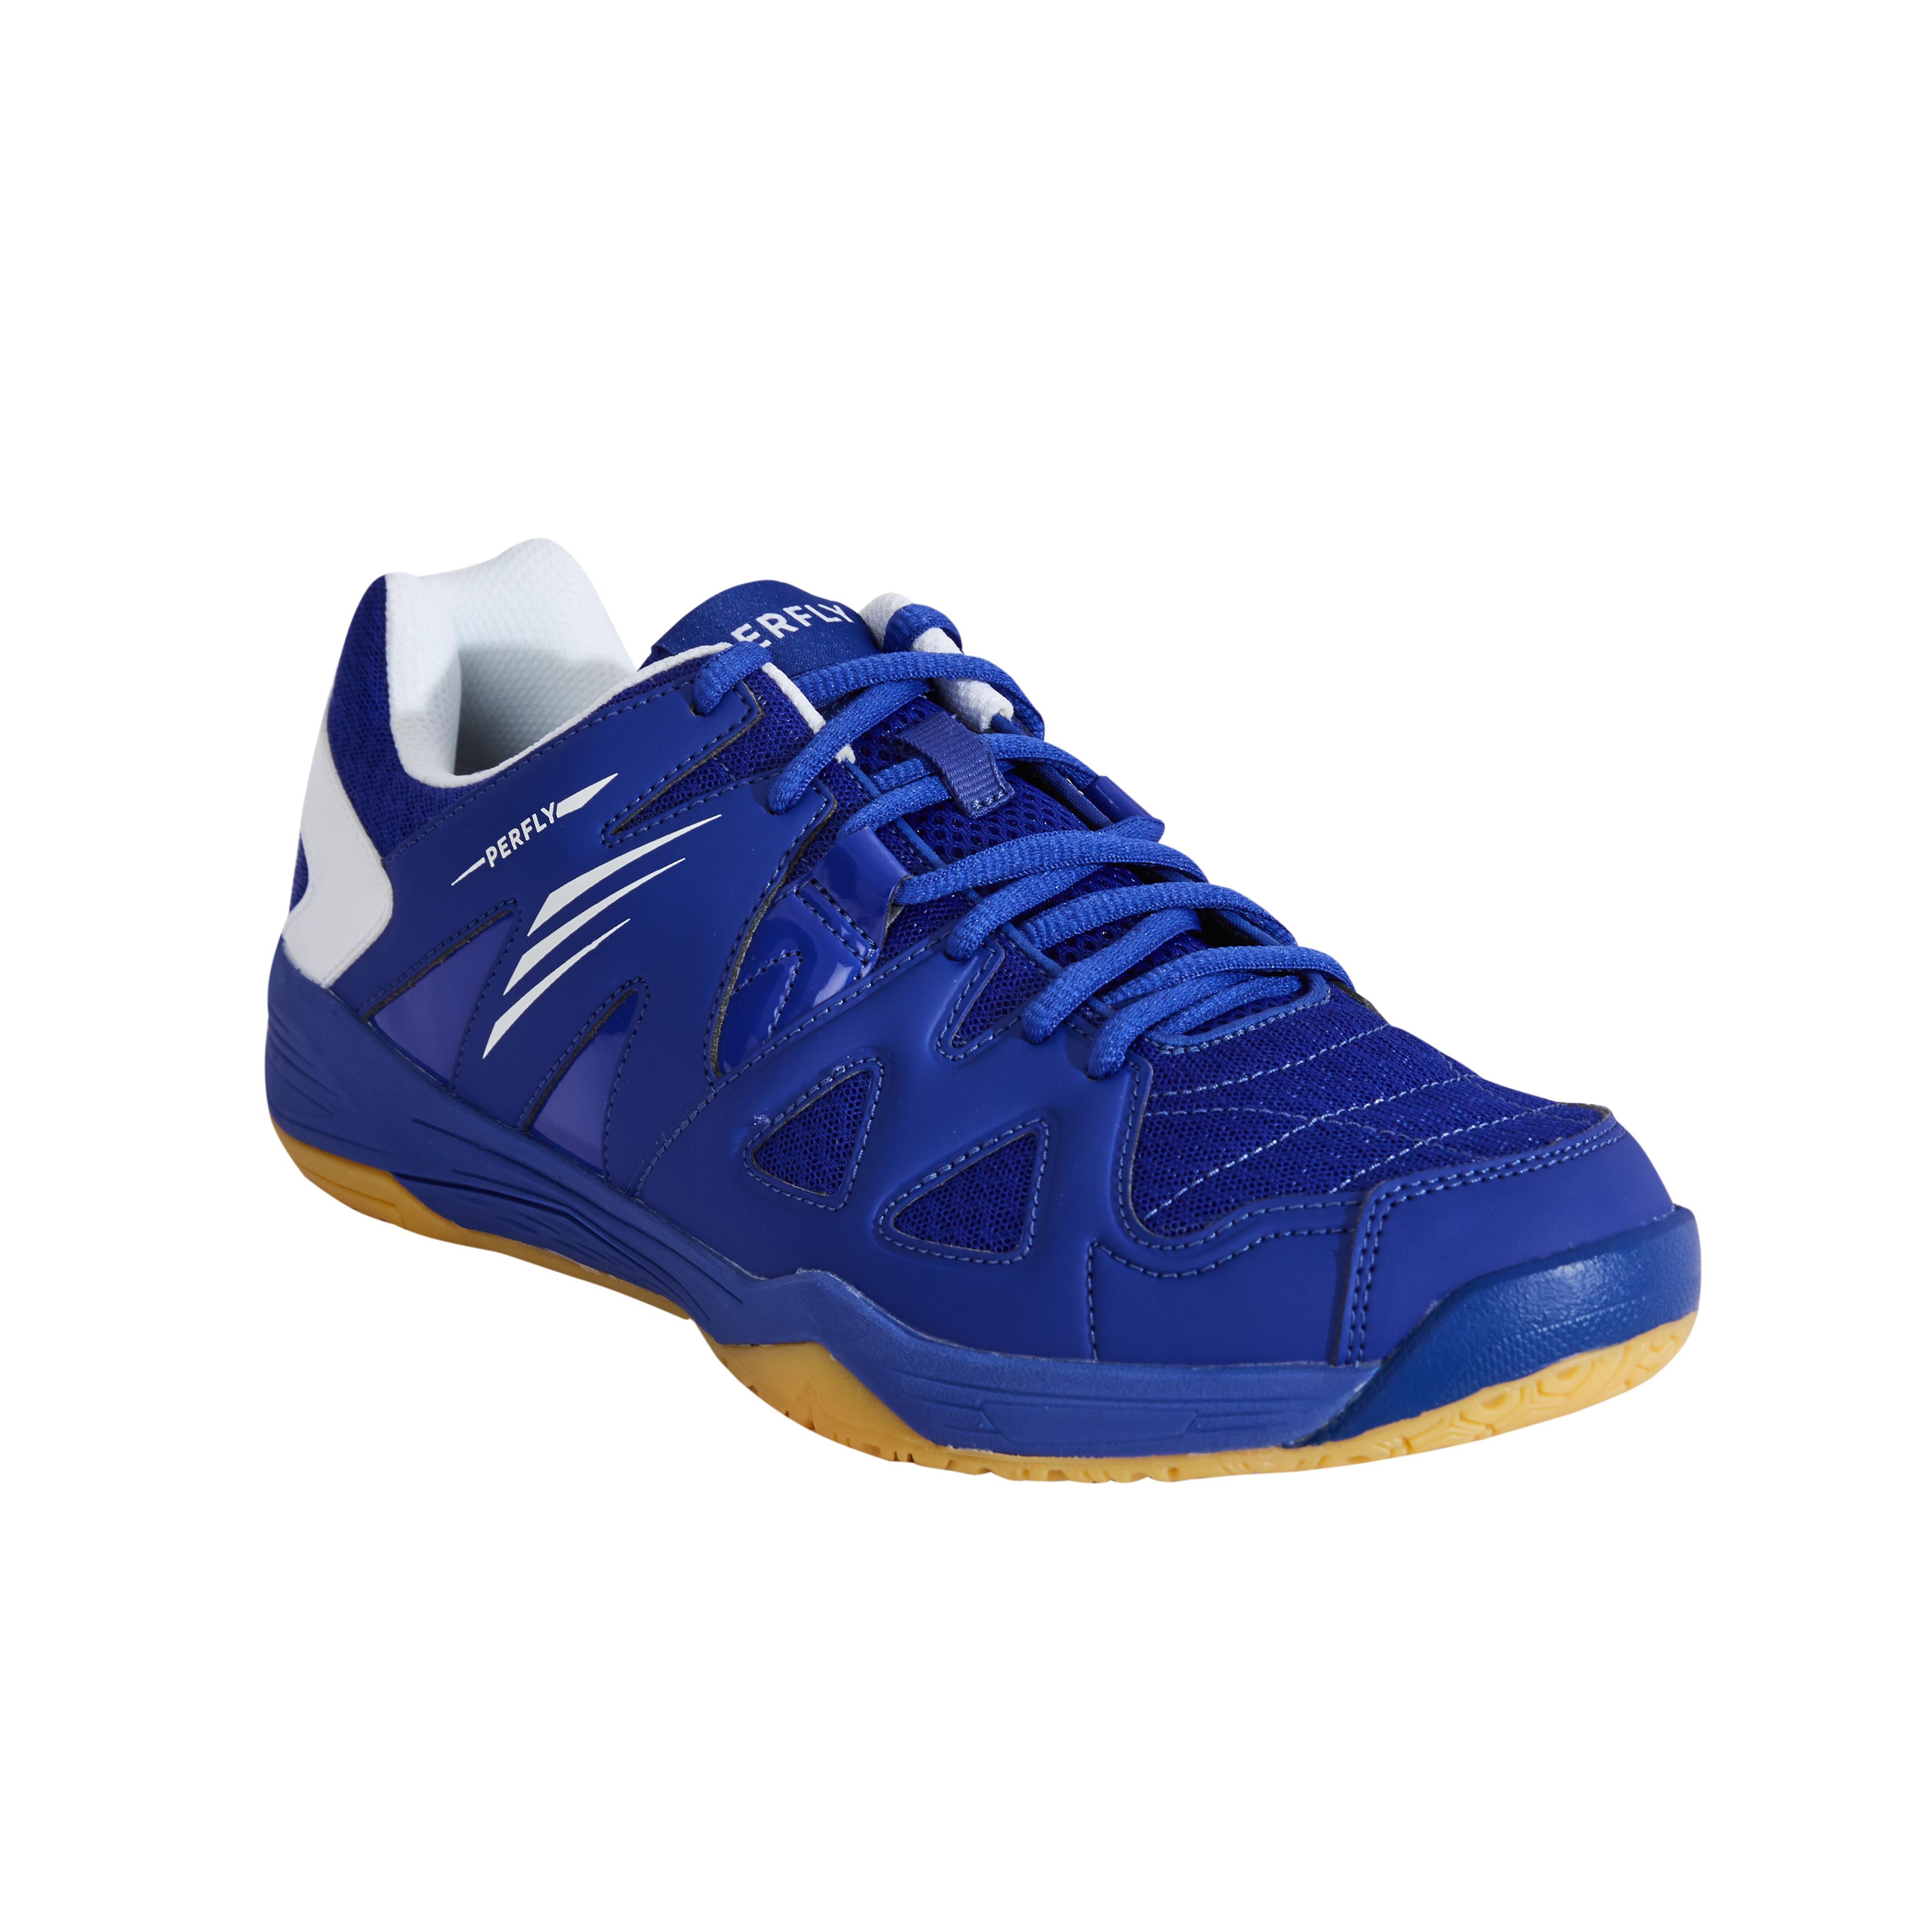 PERFLY Chaussures De Badminton pour Homme BS530 - Bleu - PERFLY - 41